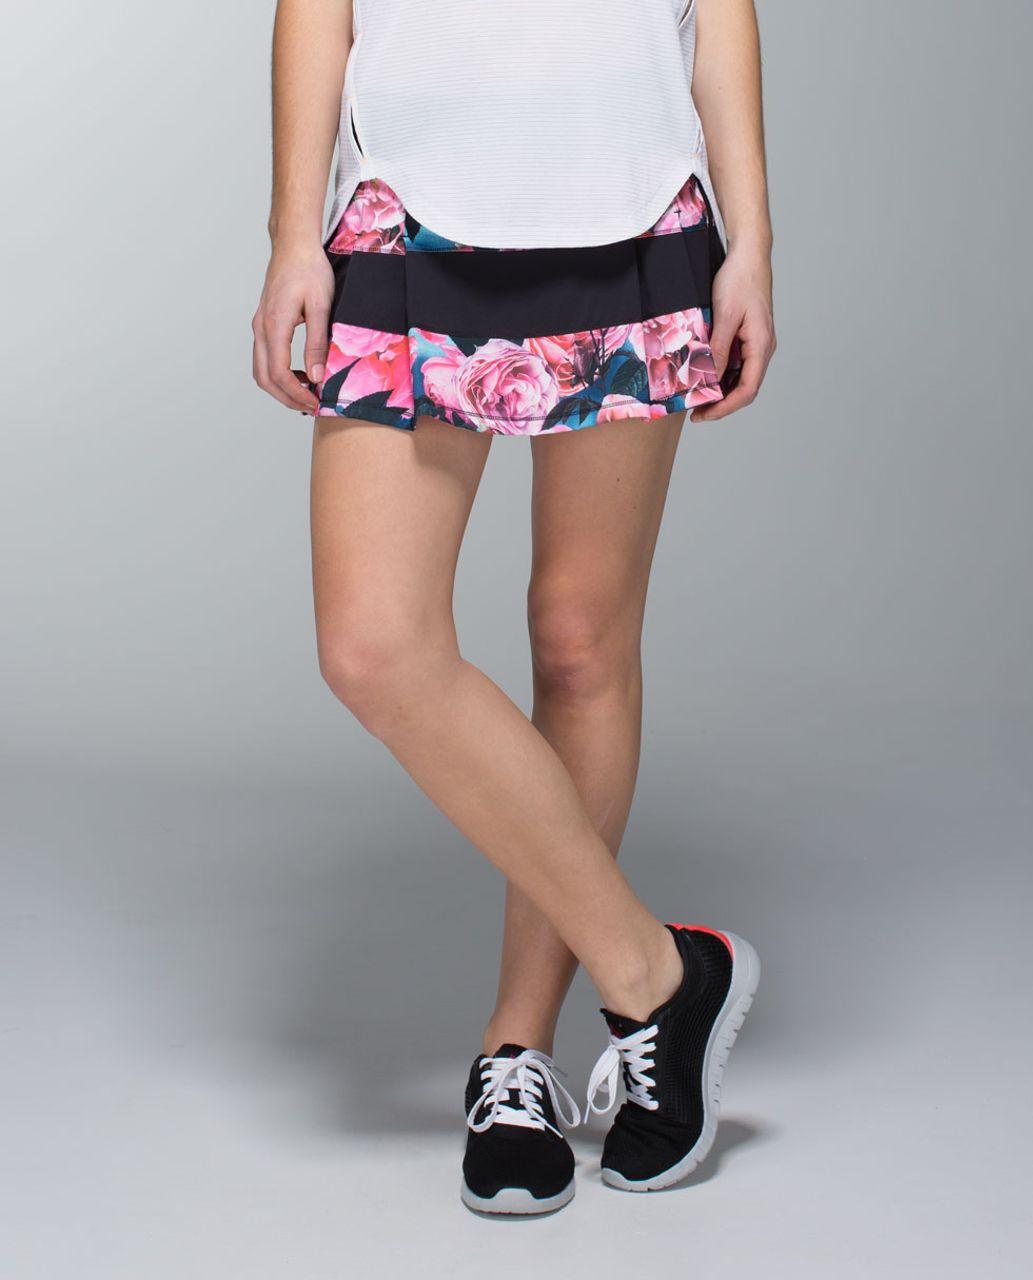 Lululemon Pace Rival Skirt (Regular) *4-way Stretch - Secret Garden / Black